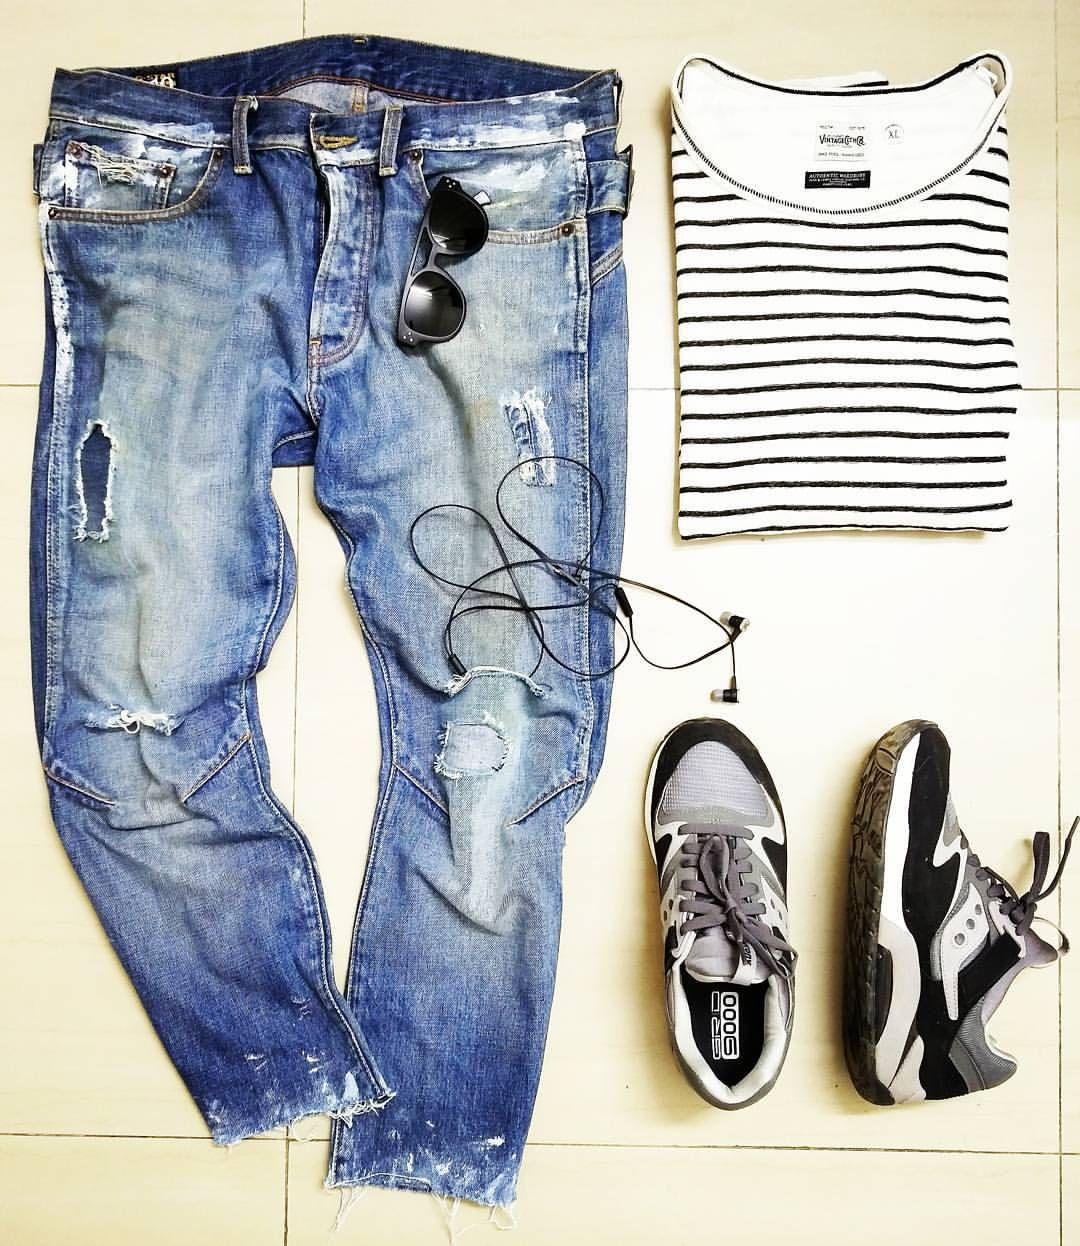 DIY #gstar denim and stripes.. Everyday staple look ;-) #look #lookoftheday #denimstyle #gstar #rippedjeans #vintagedenim #menswear #outfit #denimblog #outfitoftheday #jeans #denimlove #denimlover...